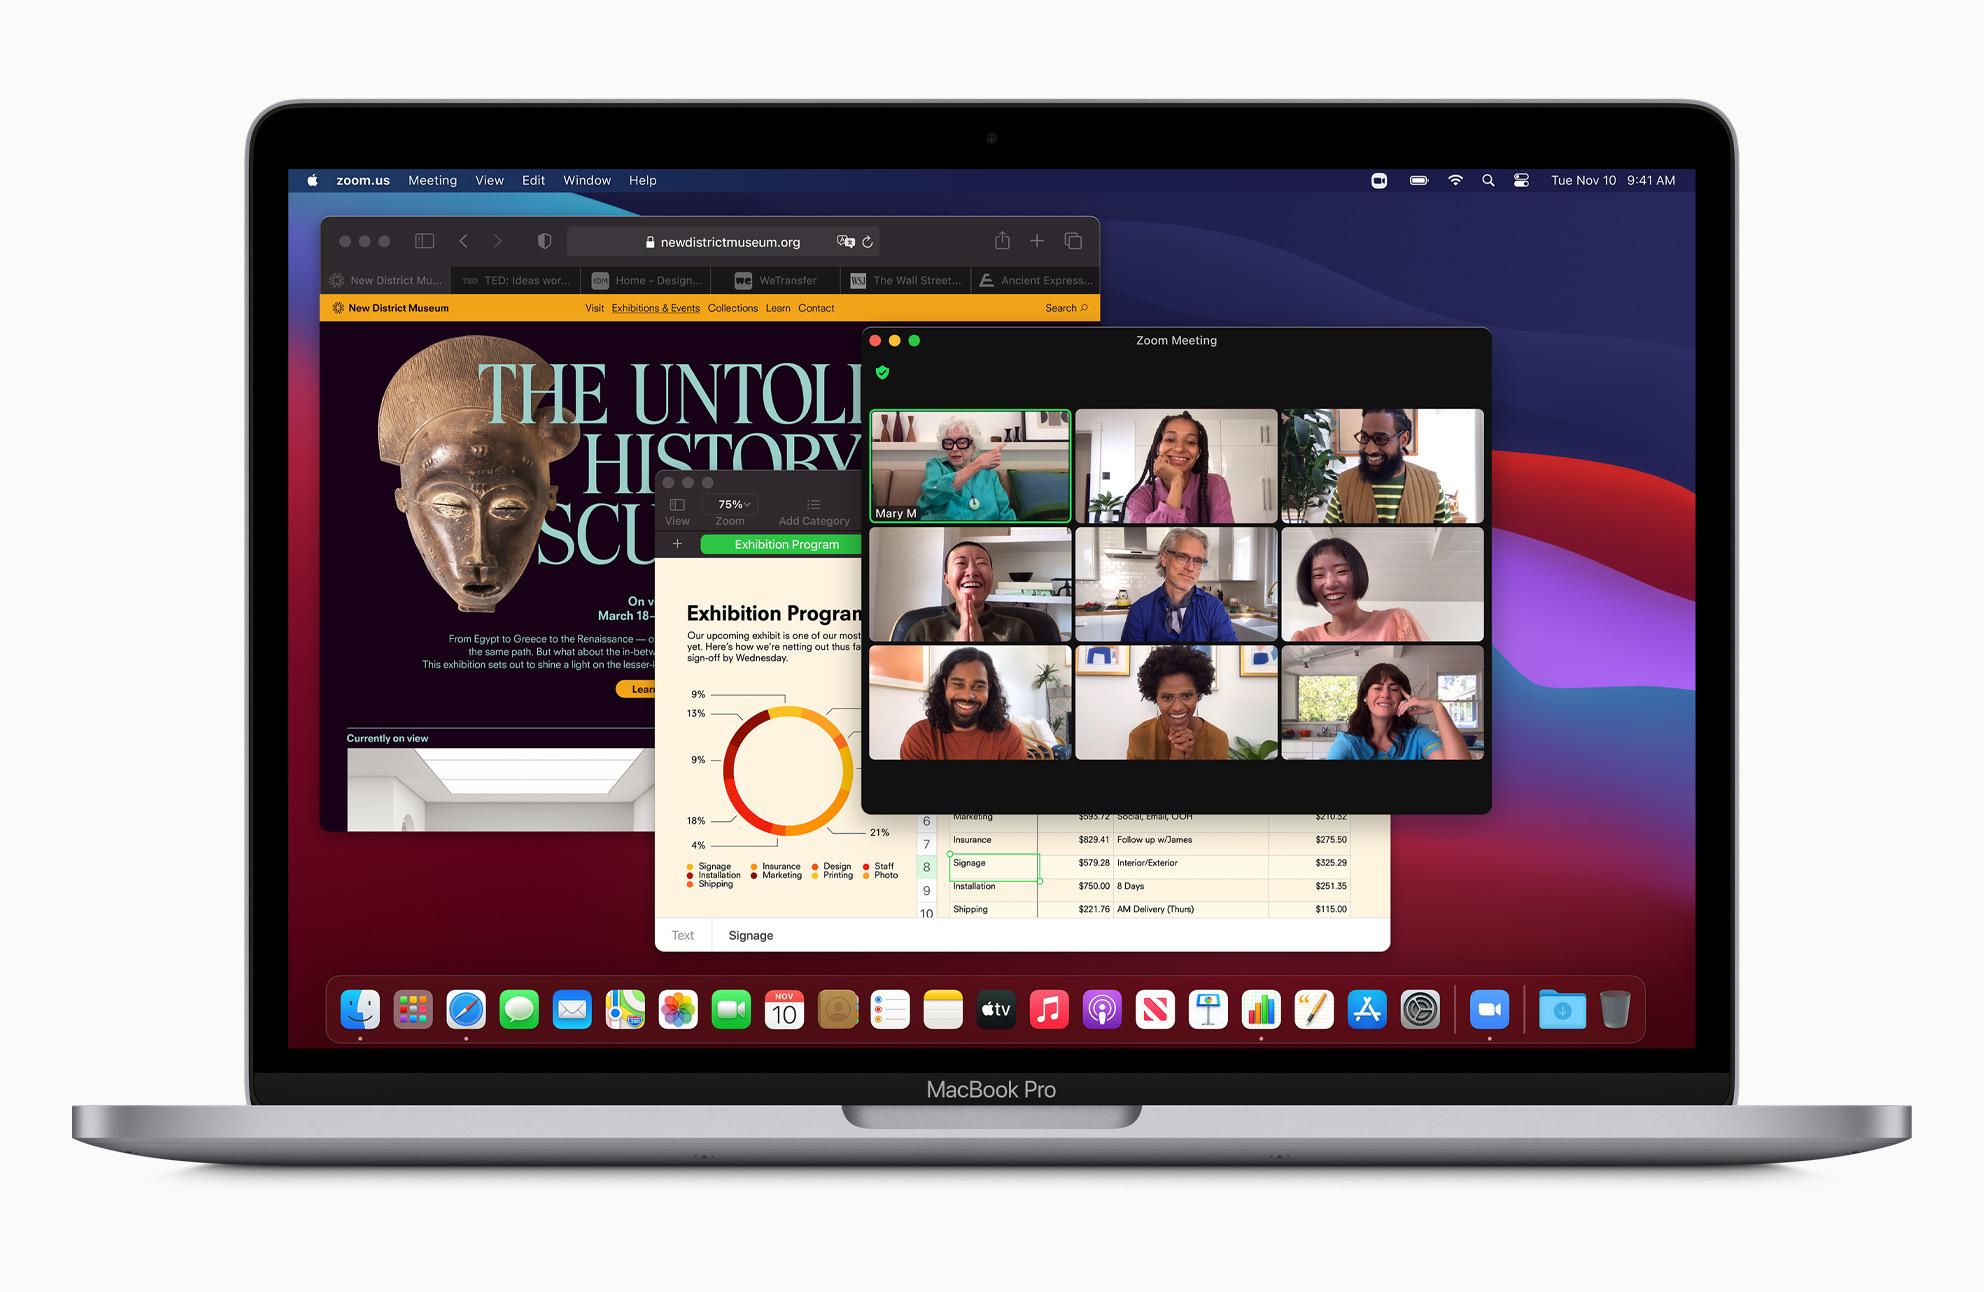 M1 MacBook Pro running macOS Big Sur.